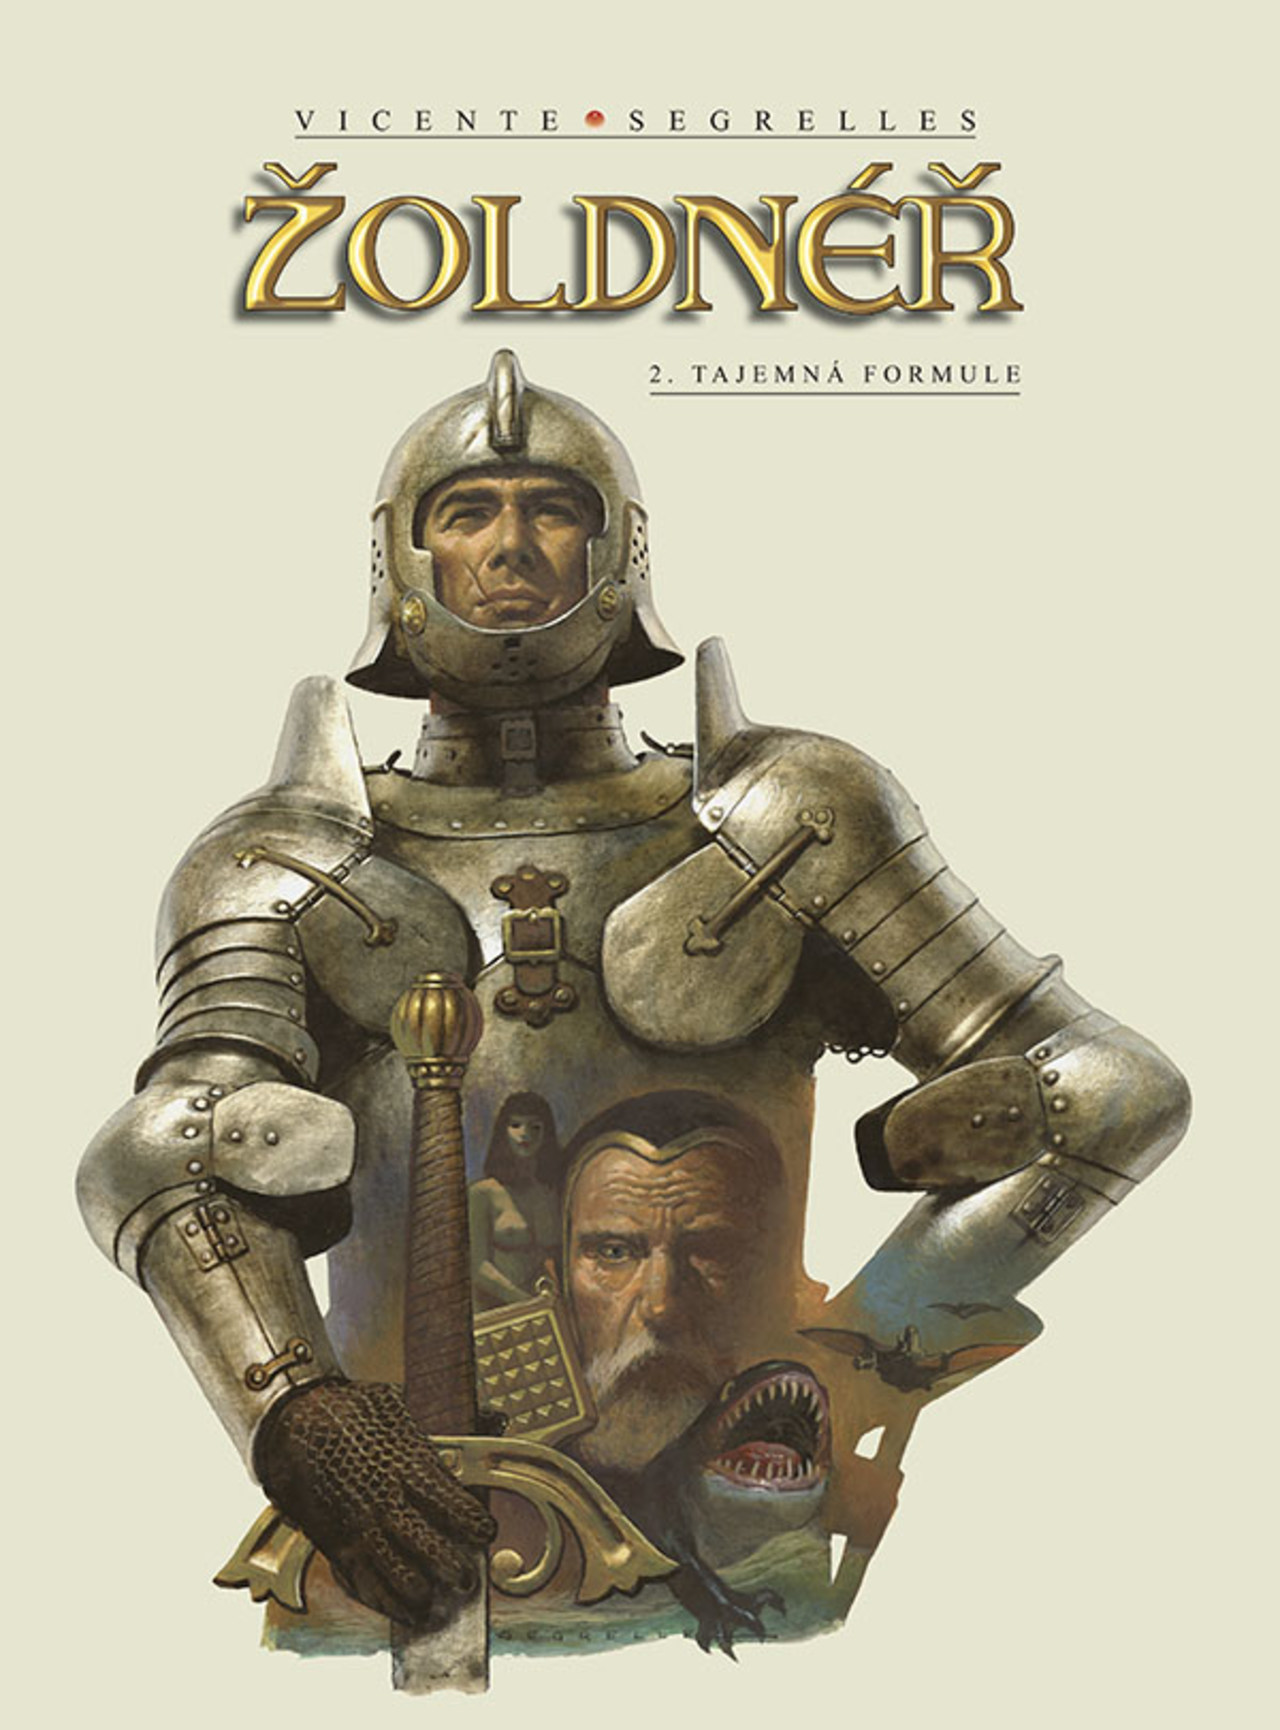 Zoldner-02